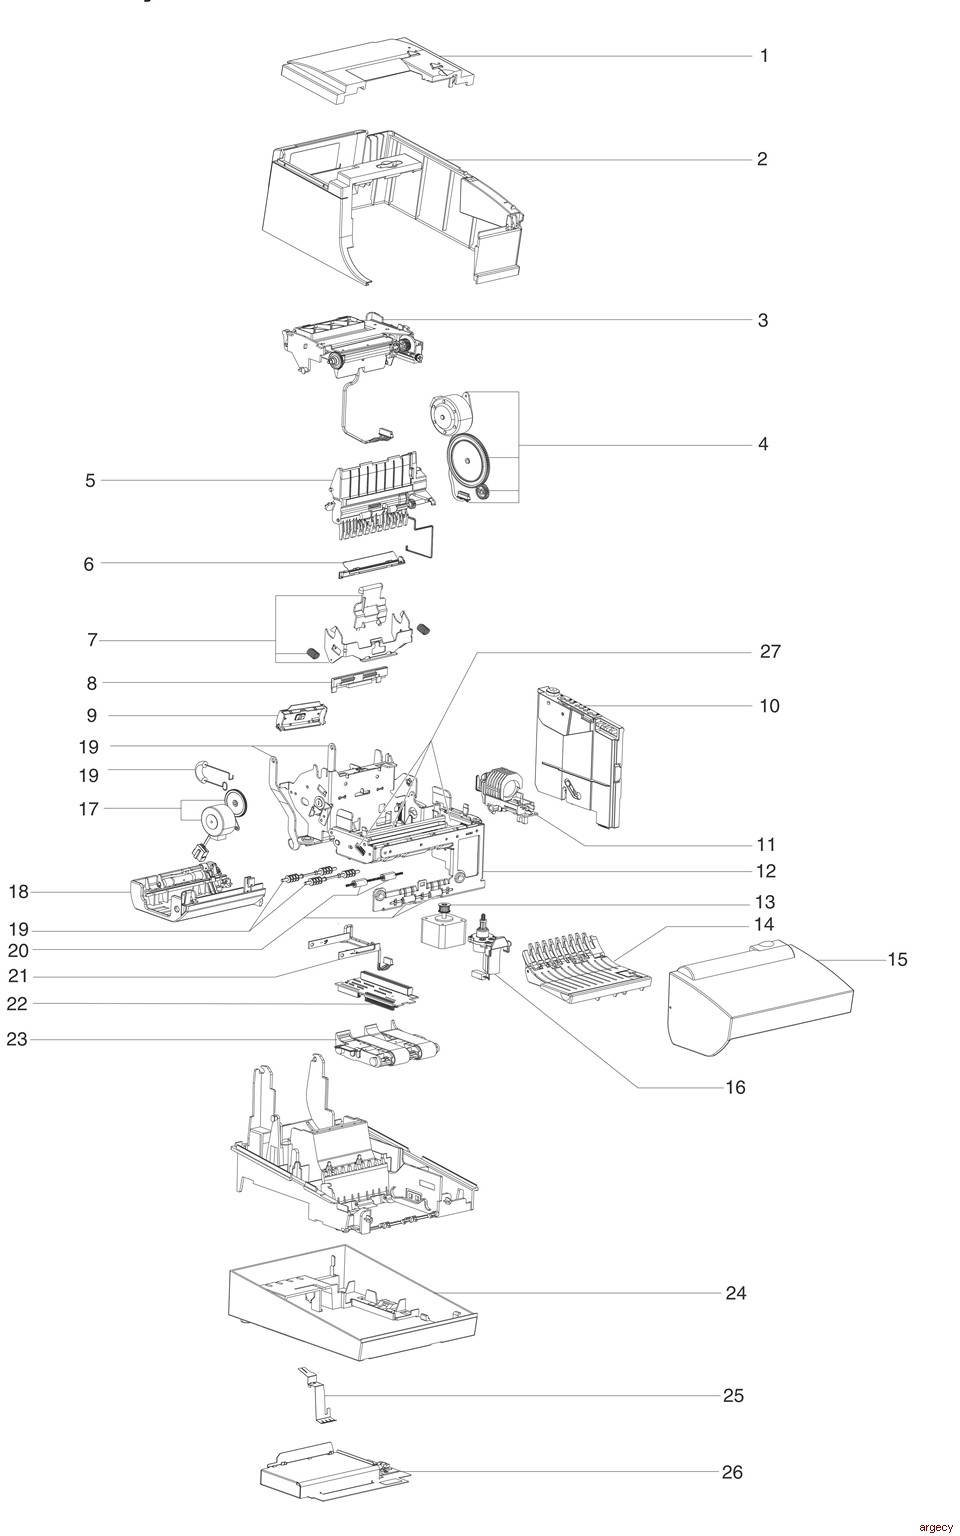 ibm printer service manual how to and user guide instructions u2022 rh taxibermuda co ibm infoprint 1572 manual ibm infoprint 1532 manual